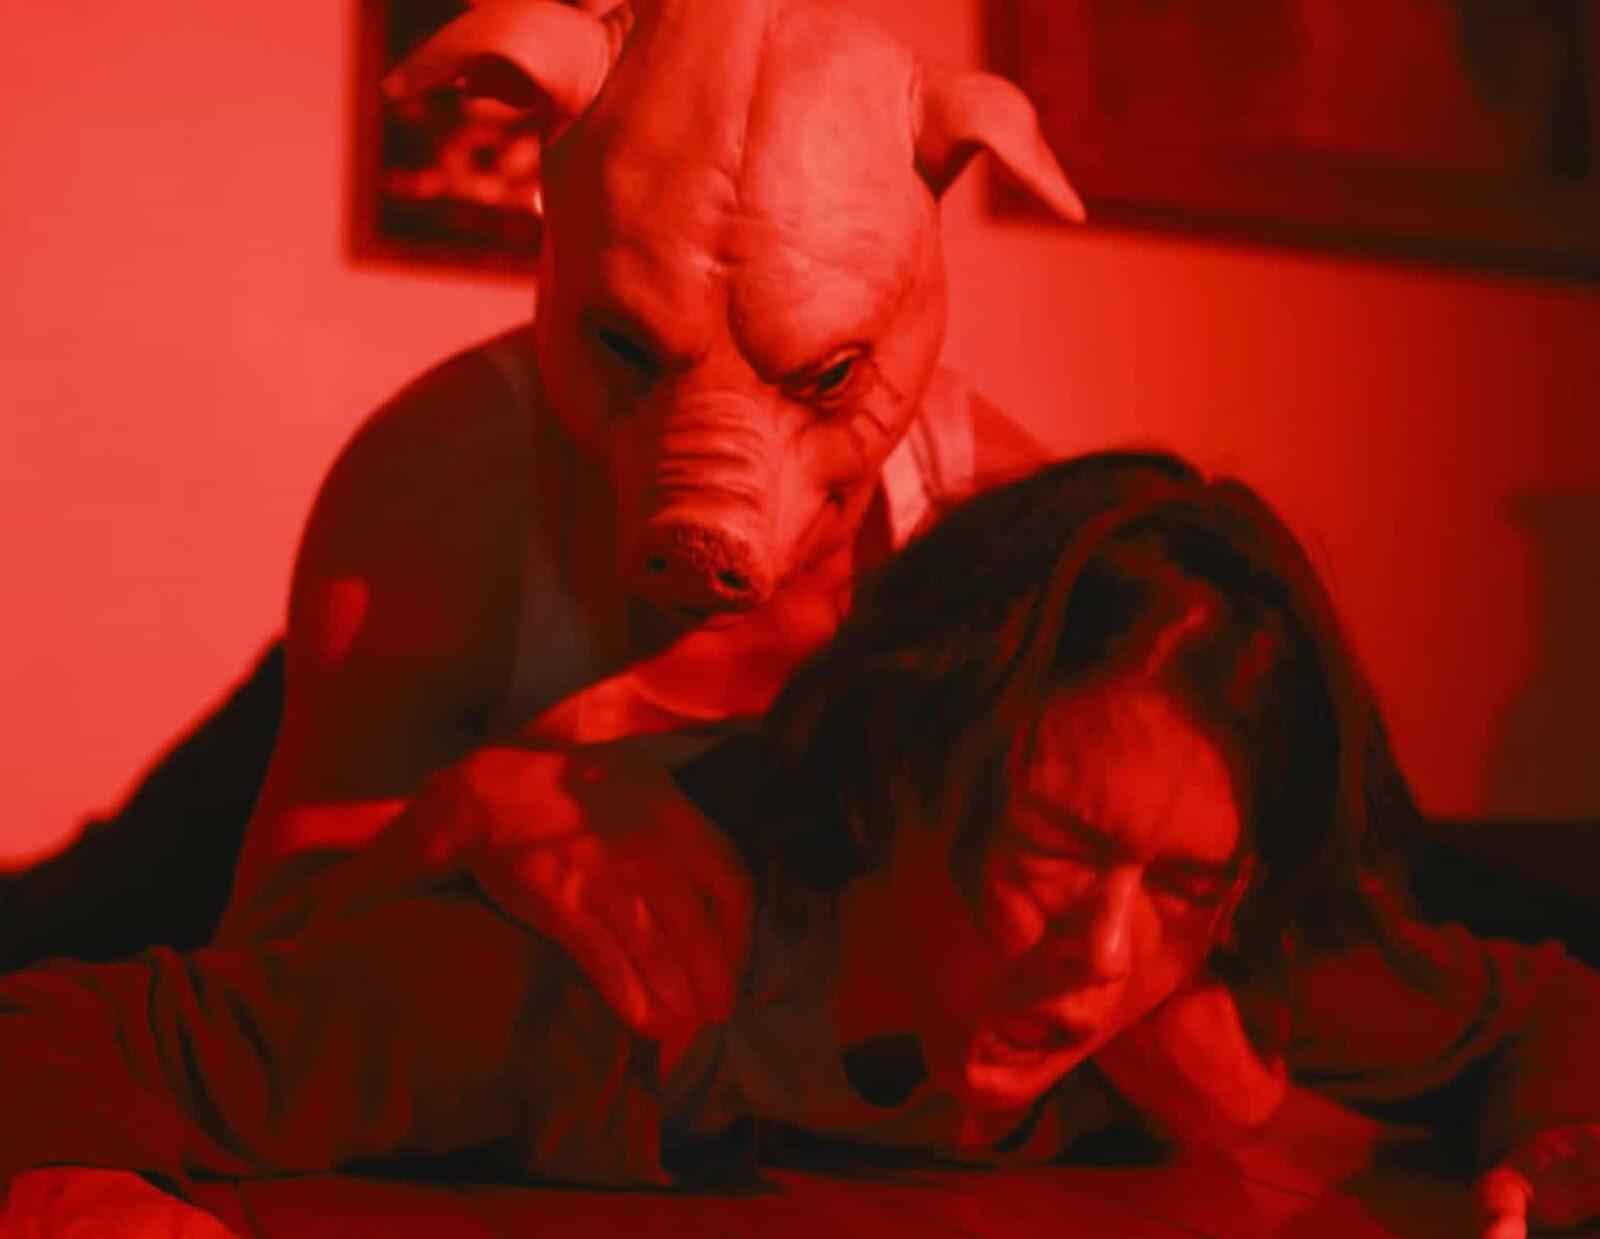 Watch Here Piggy Terror Xxx Dana Vespoli On Hardcore Extreme